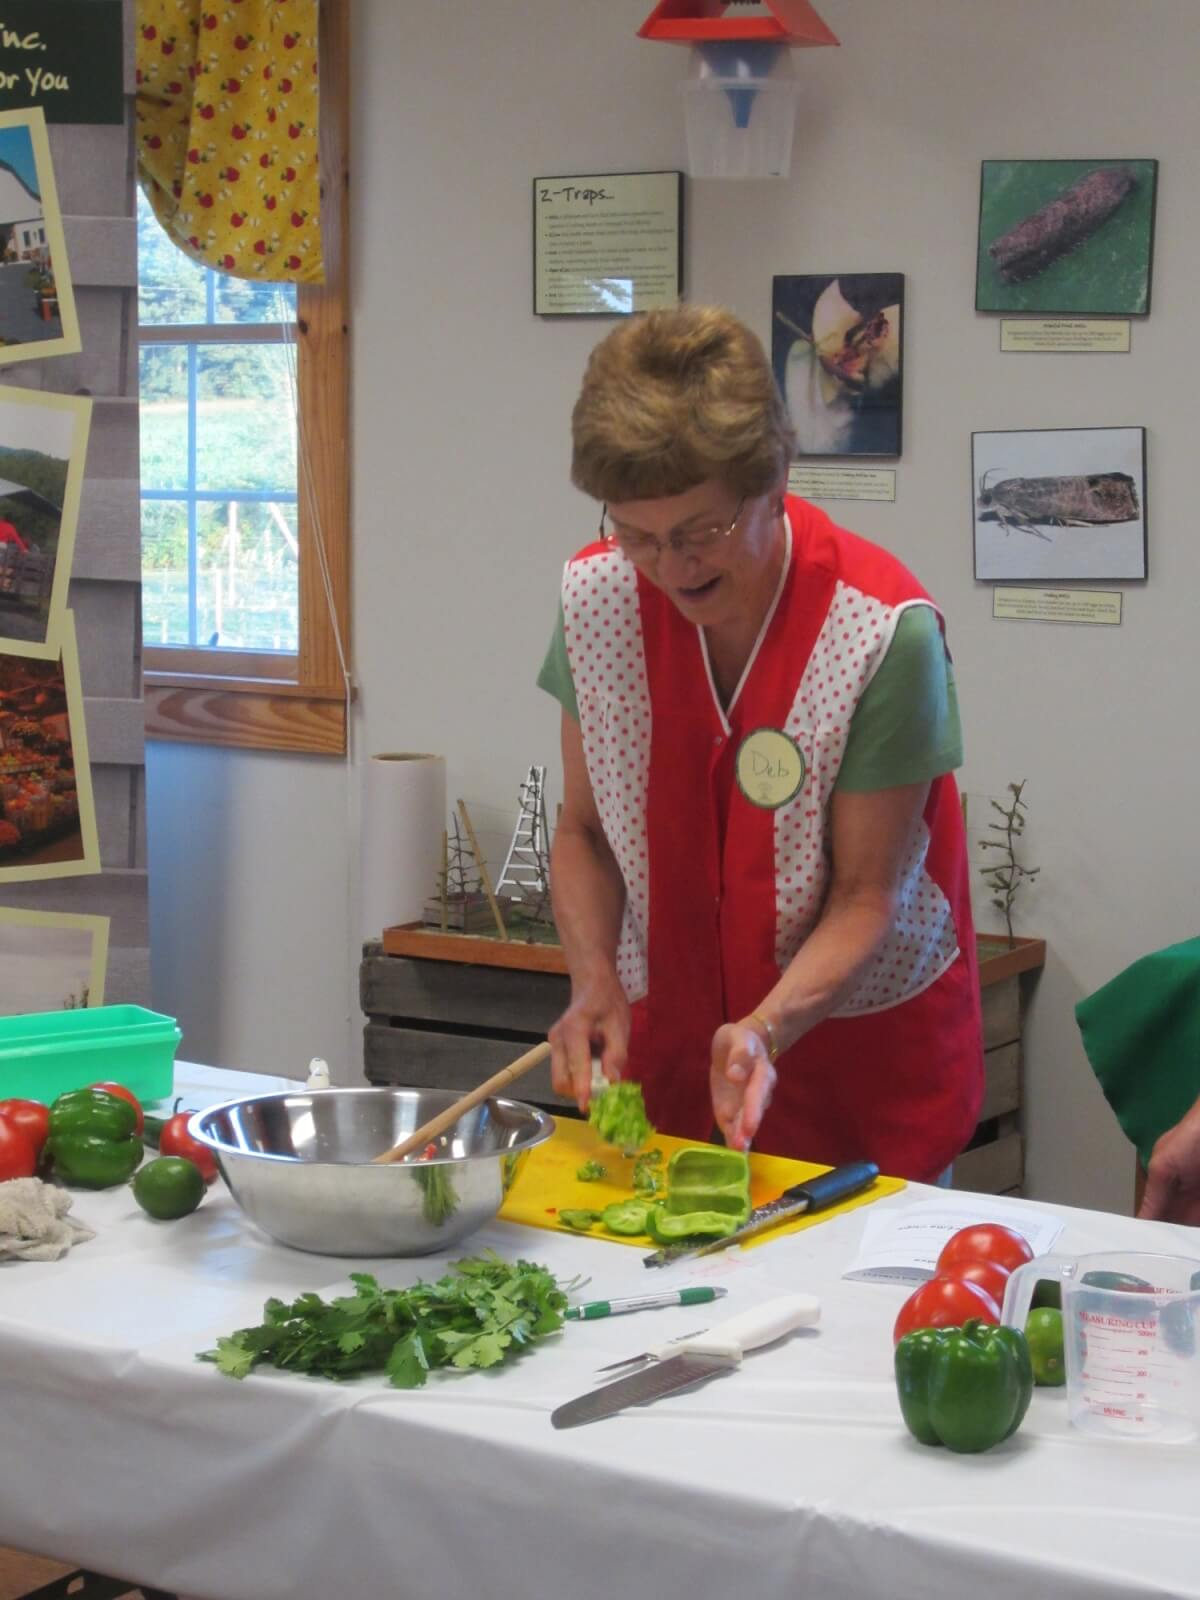 Woman making salsa